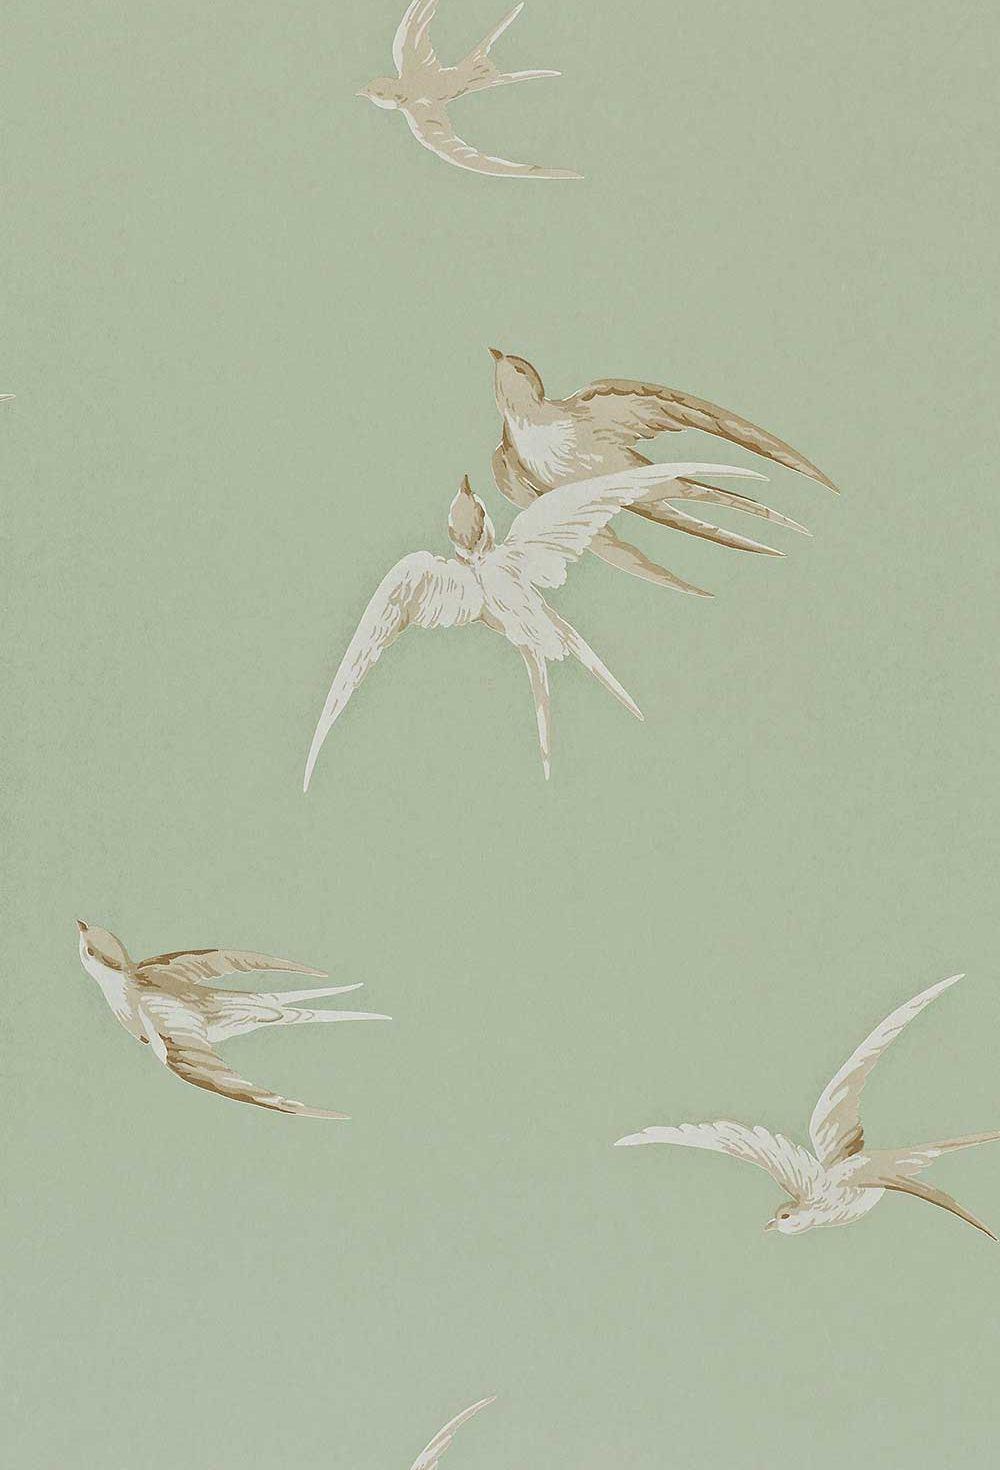 Swallows by sanderson grey green wallpaper direct - Sanderson swallows wallpaper pebble ...